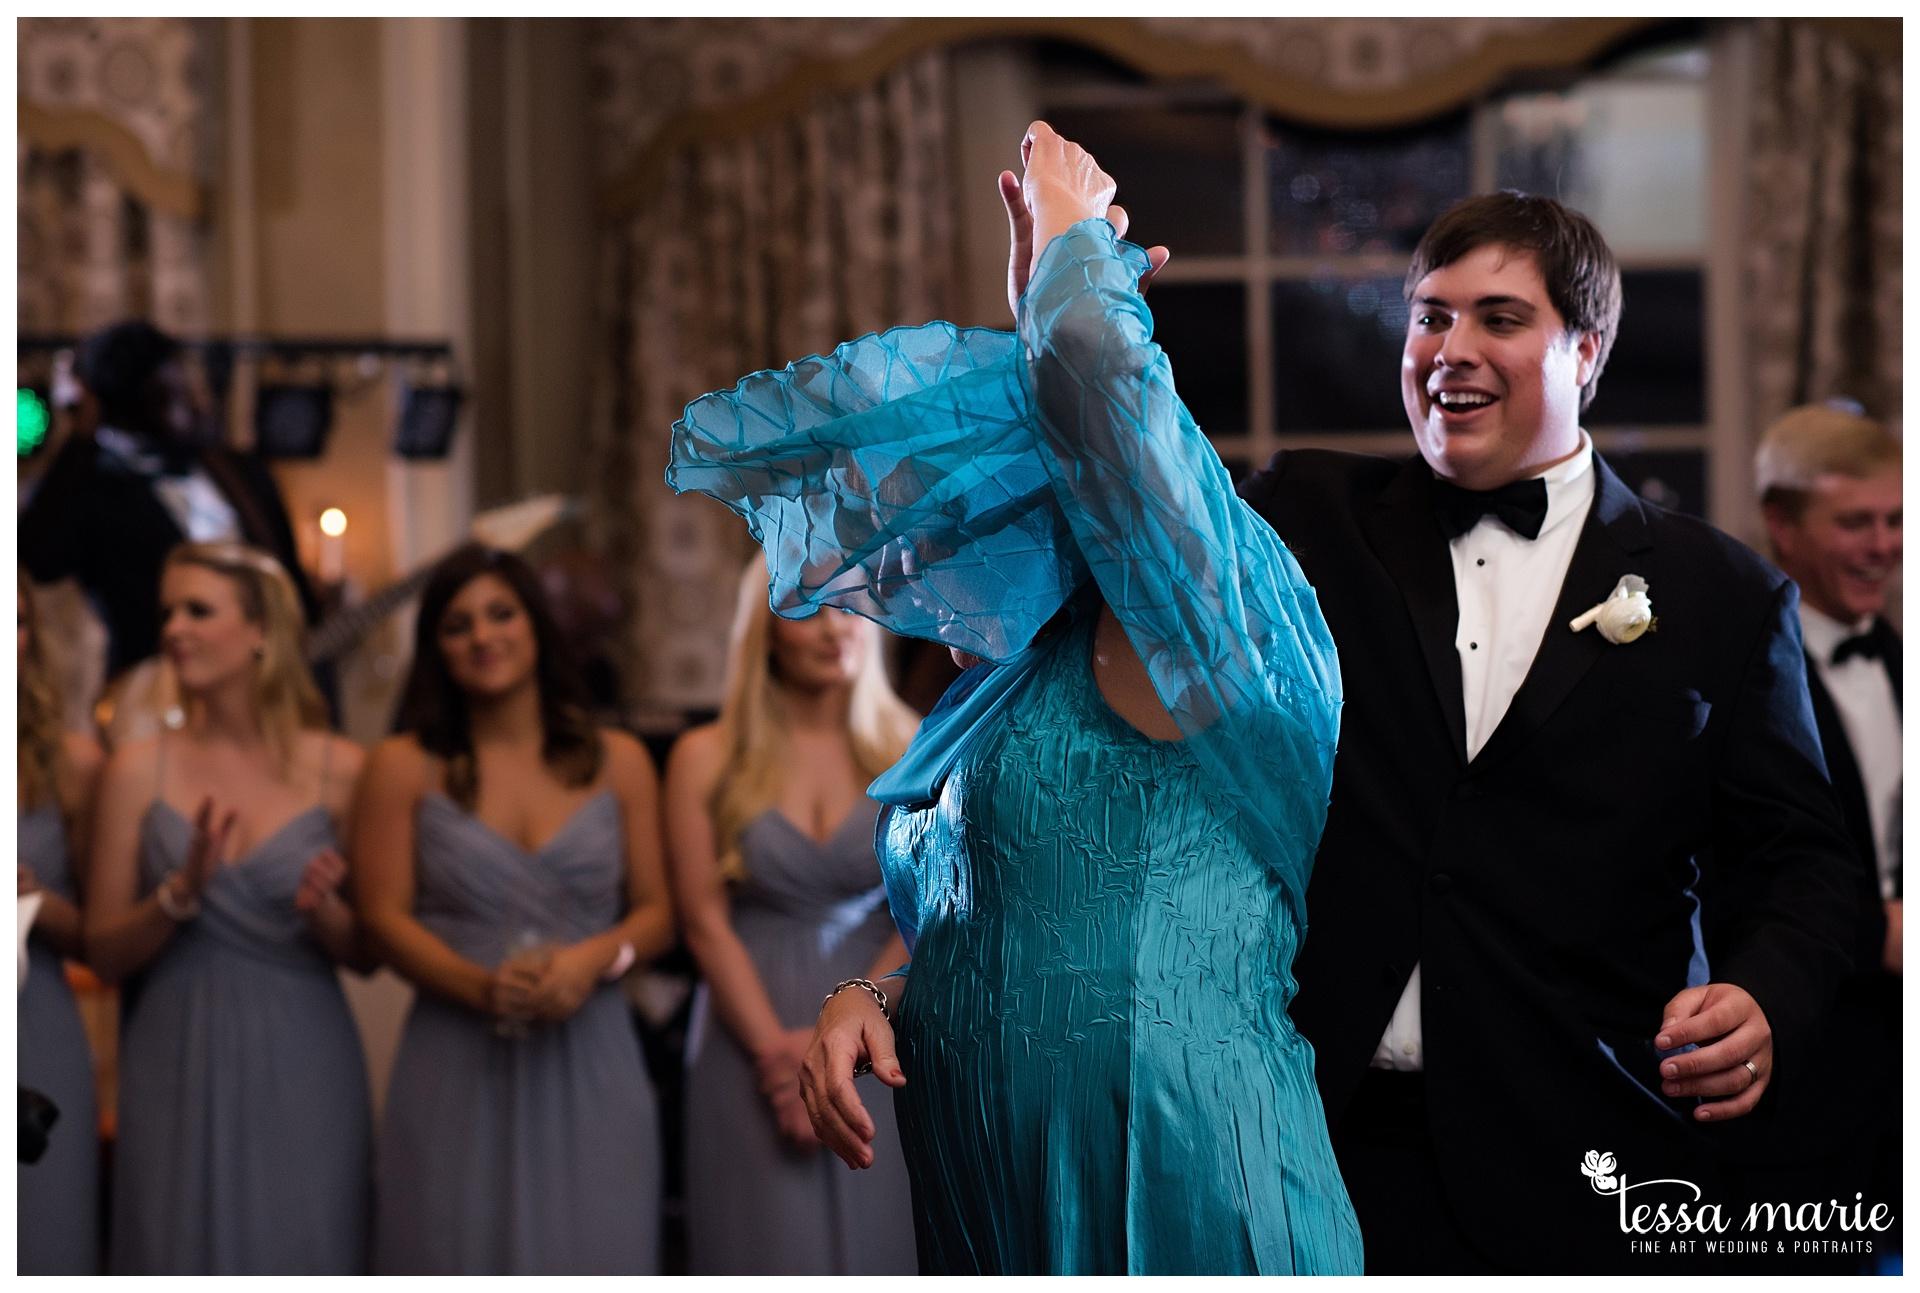 tessa_marie_weddings_legacy_story_focused_wedding_pictures_atlanta_wedding_photographer_0151